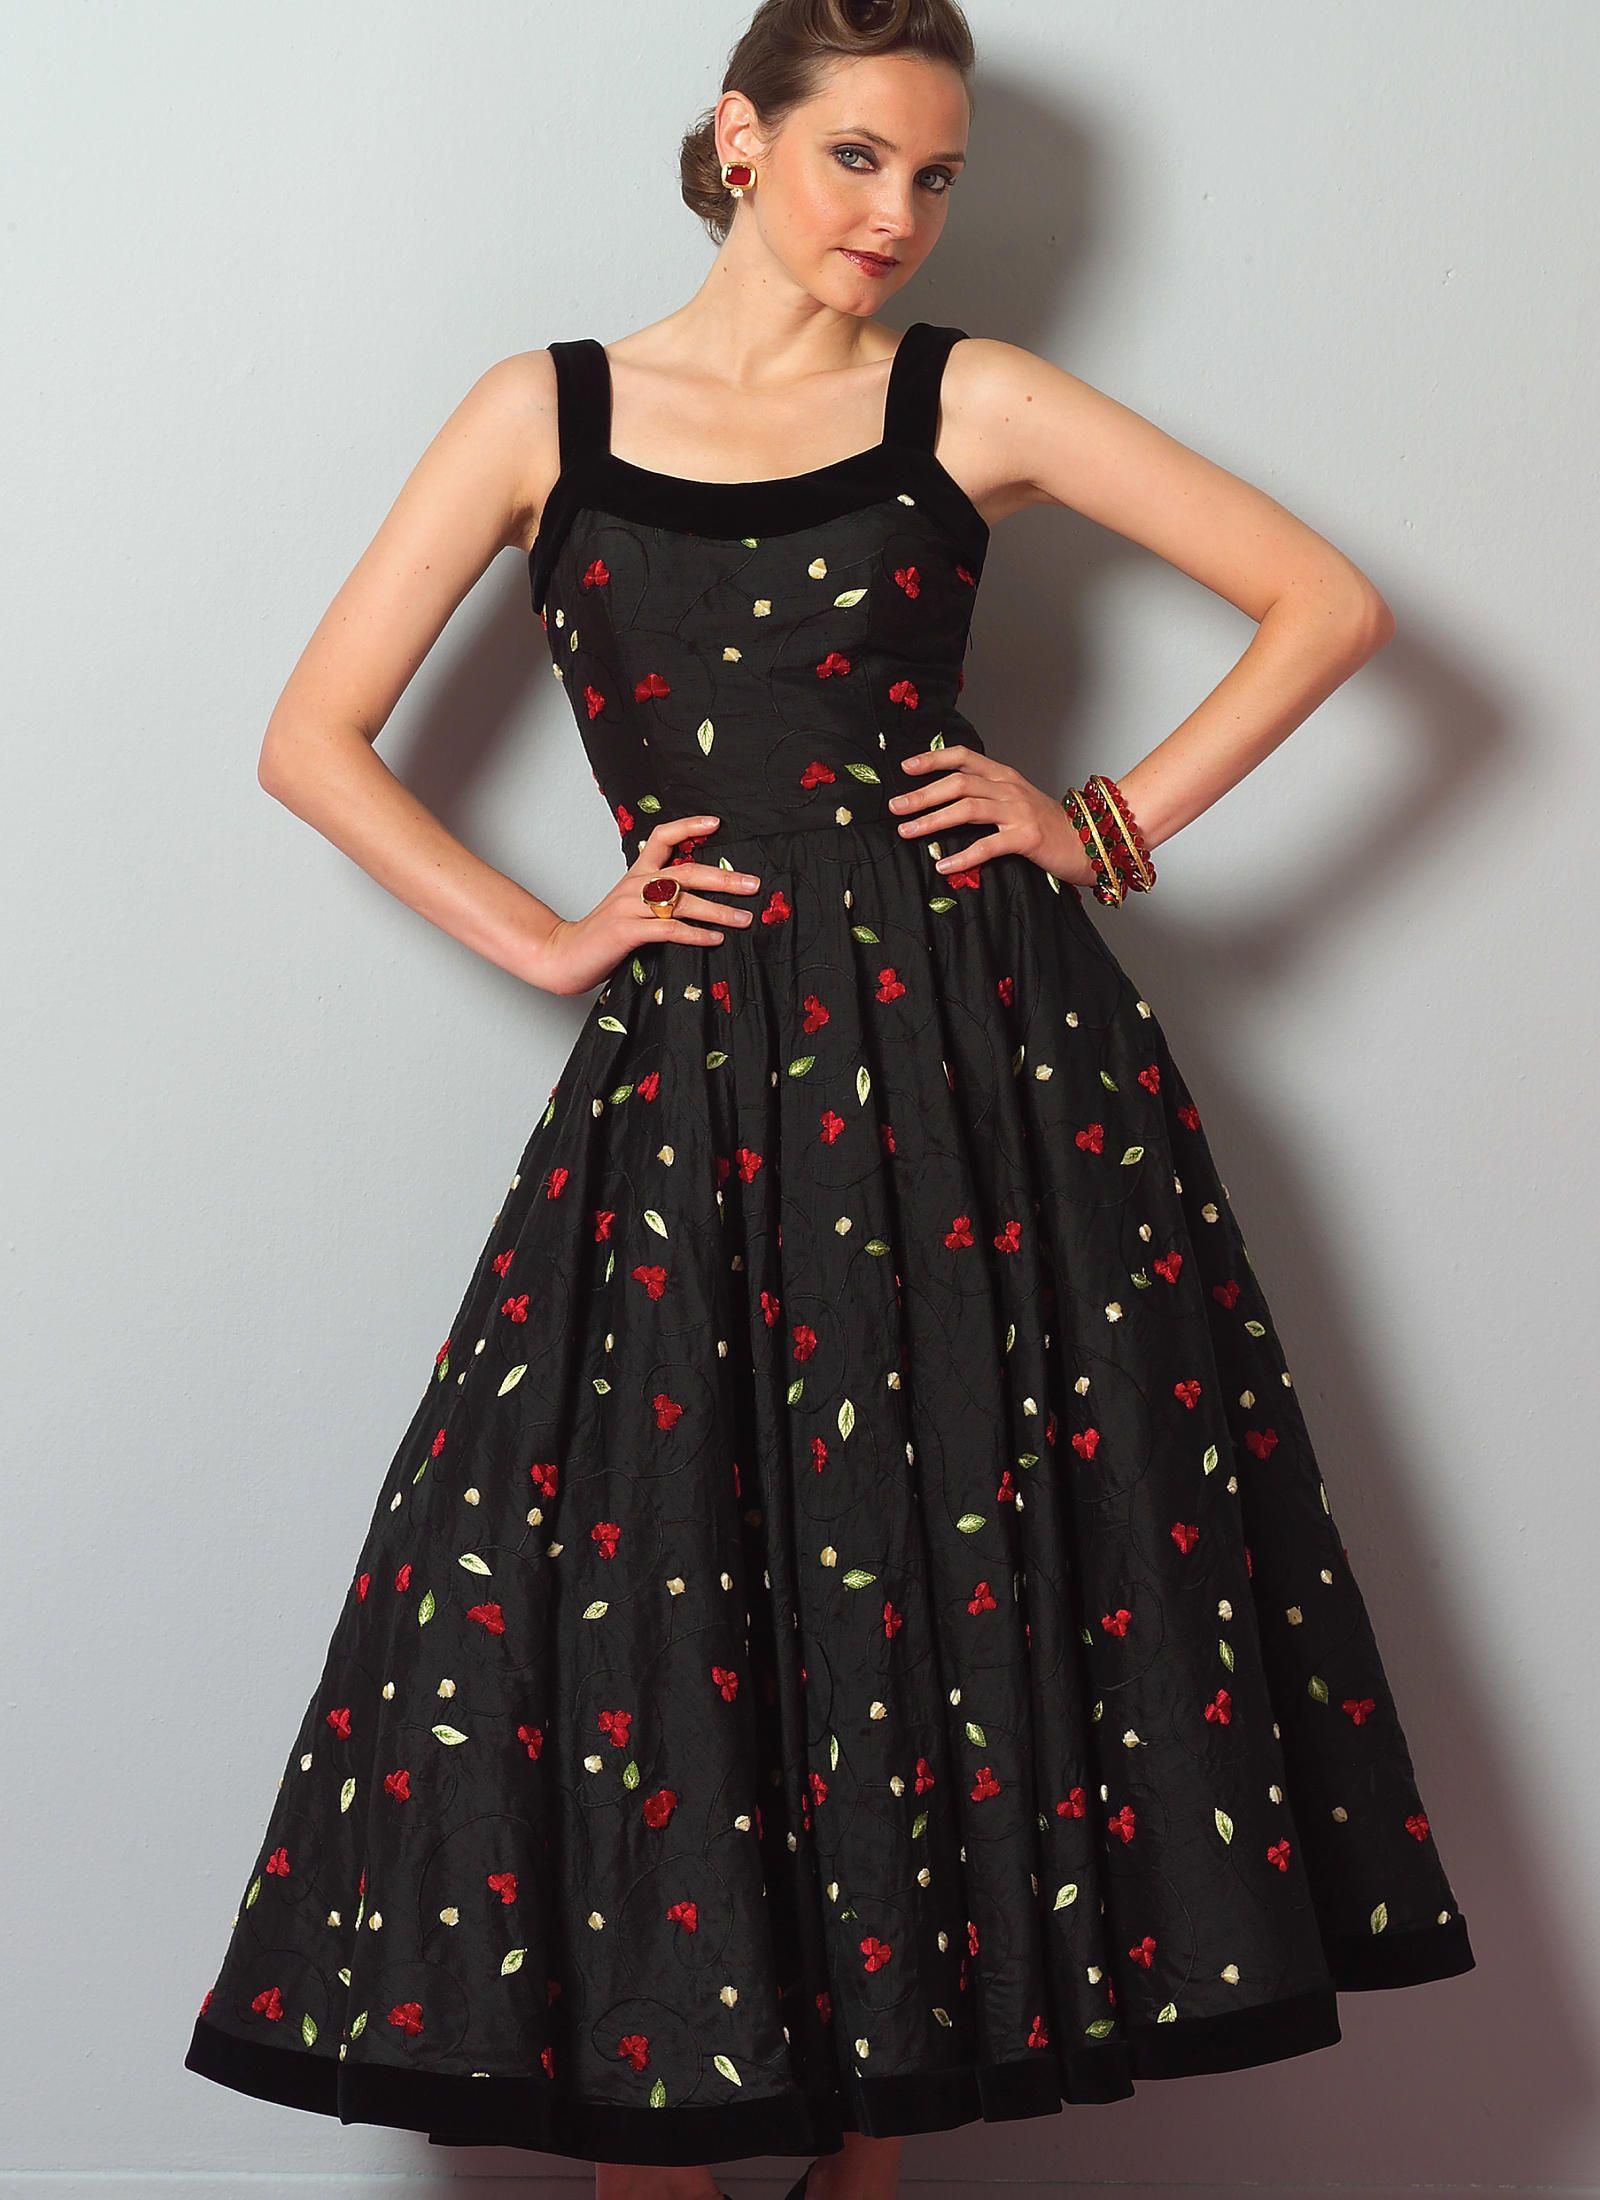 8f14249ba V2902 | Misses'/Misses' Petite Sleeveless Circular Dresses Sewing Pattern | Vogue  Patterns